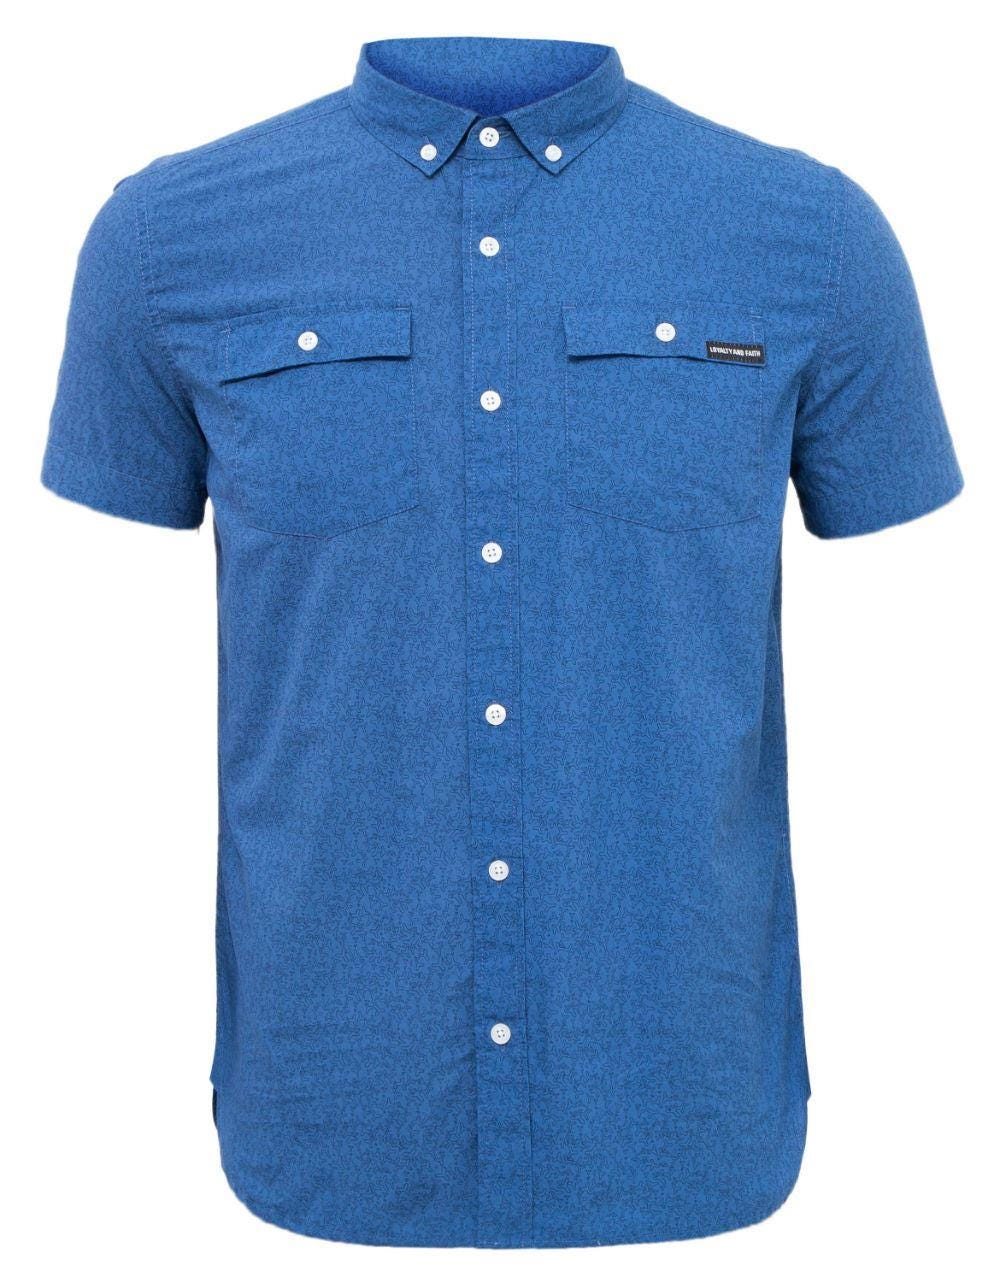 Loyalty & Faith Bronte Shirt - Blue|3XL